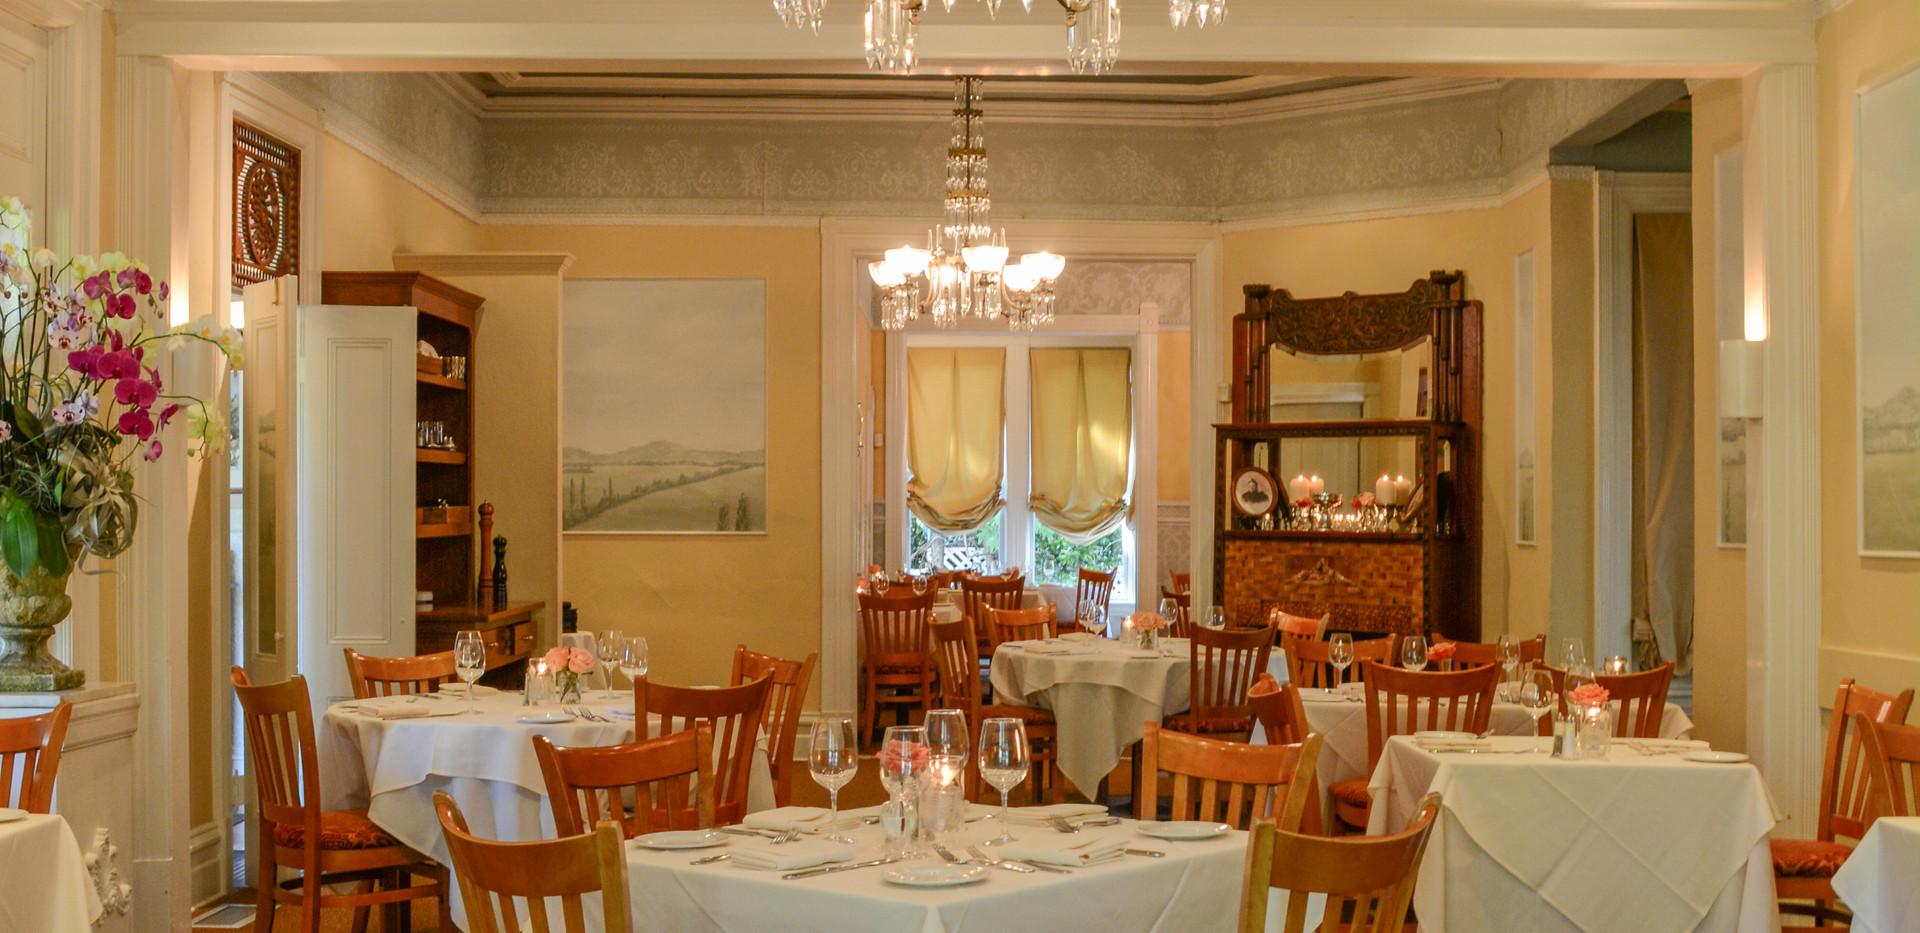 DSC_2591 Main dining ind. tables .JPG